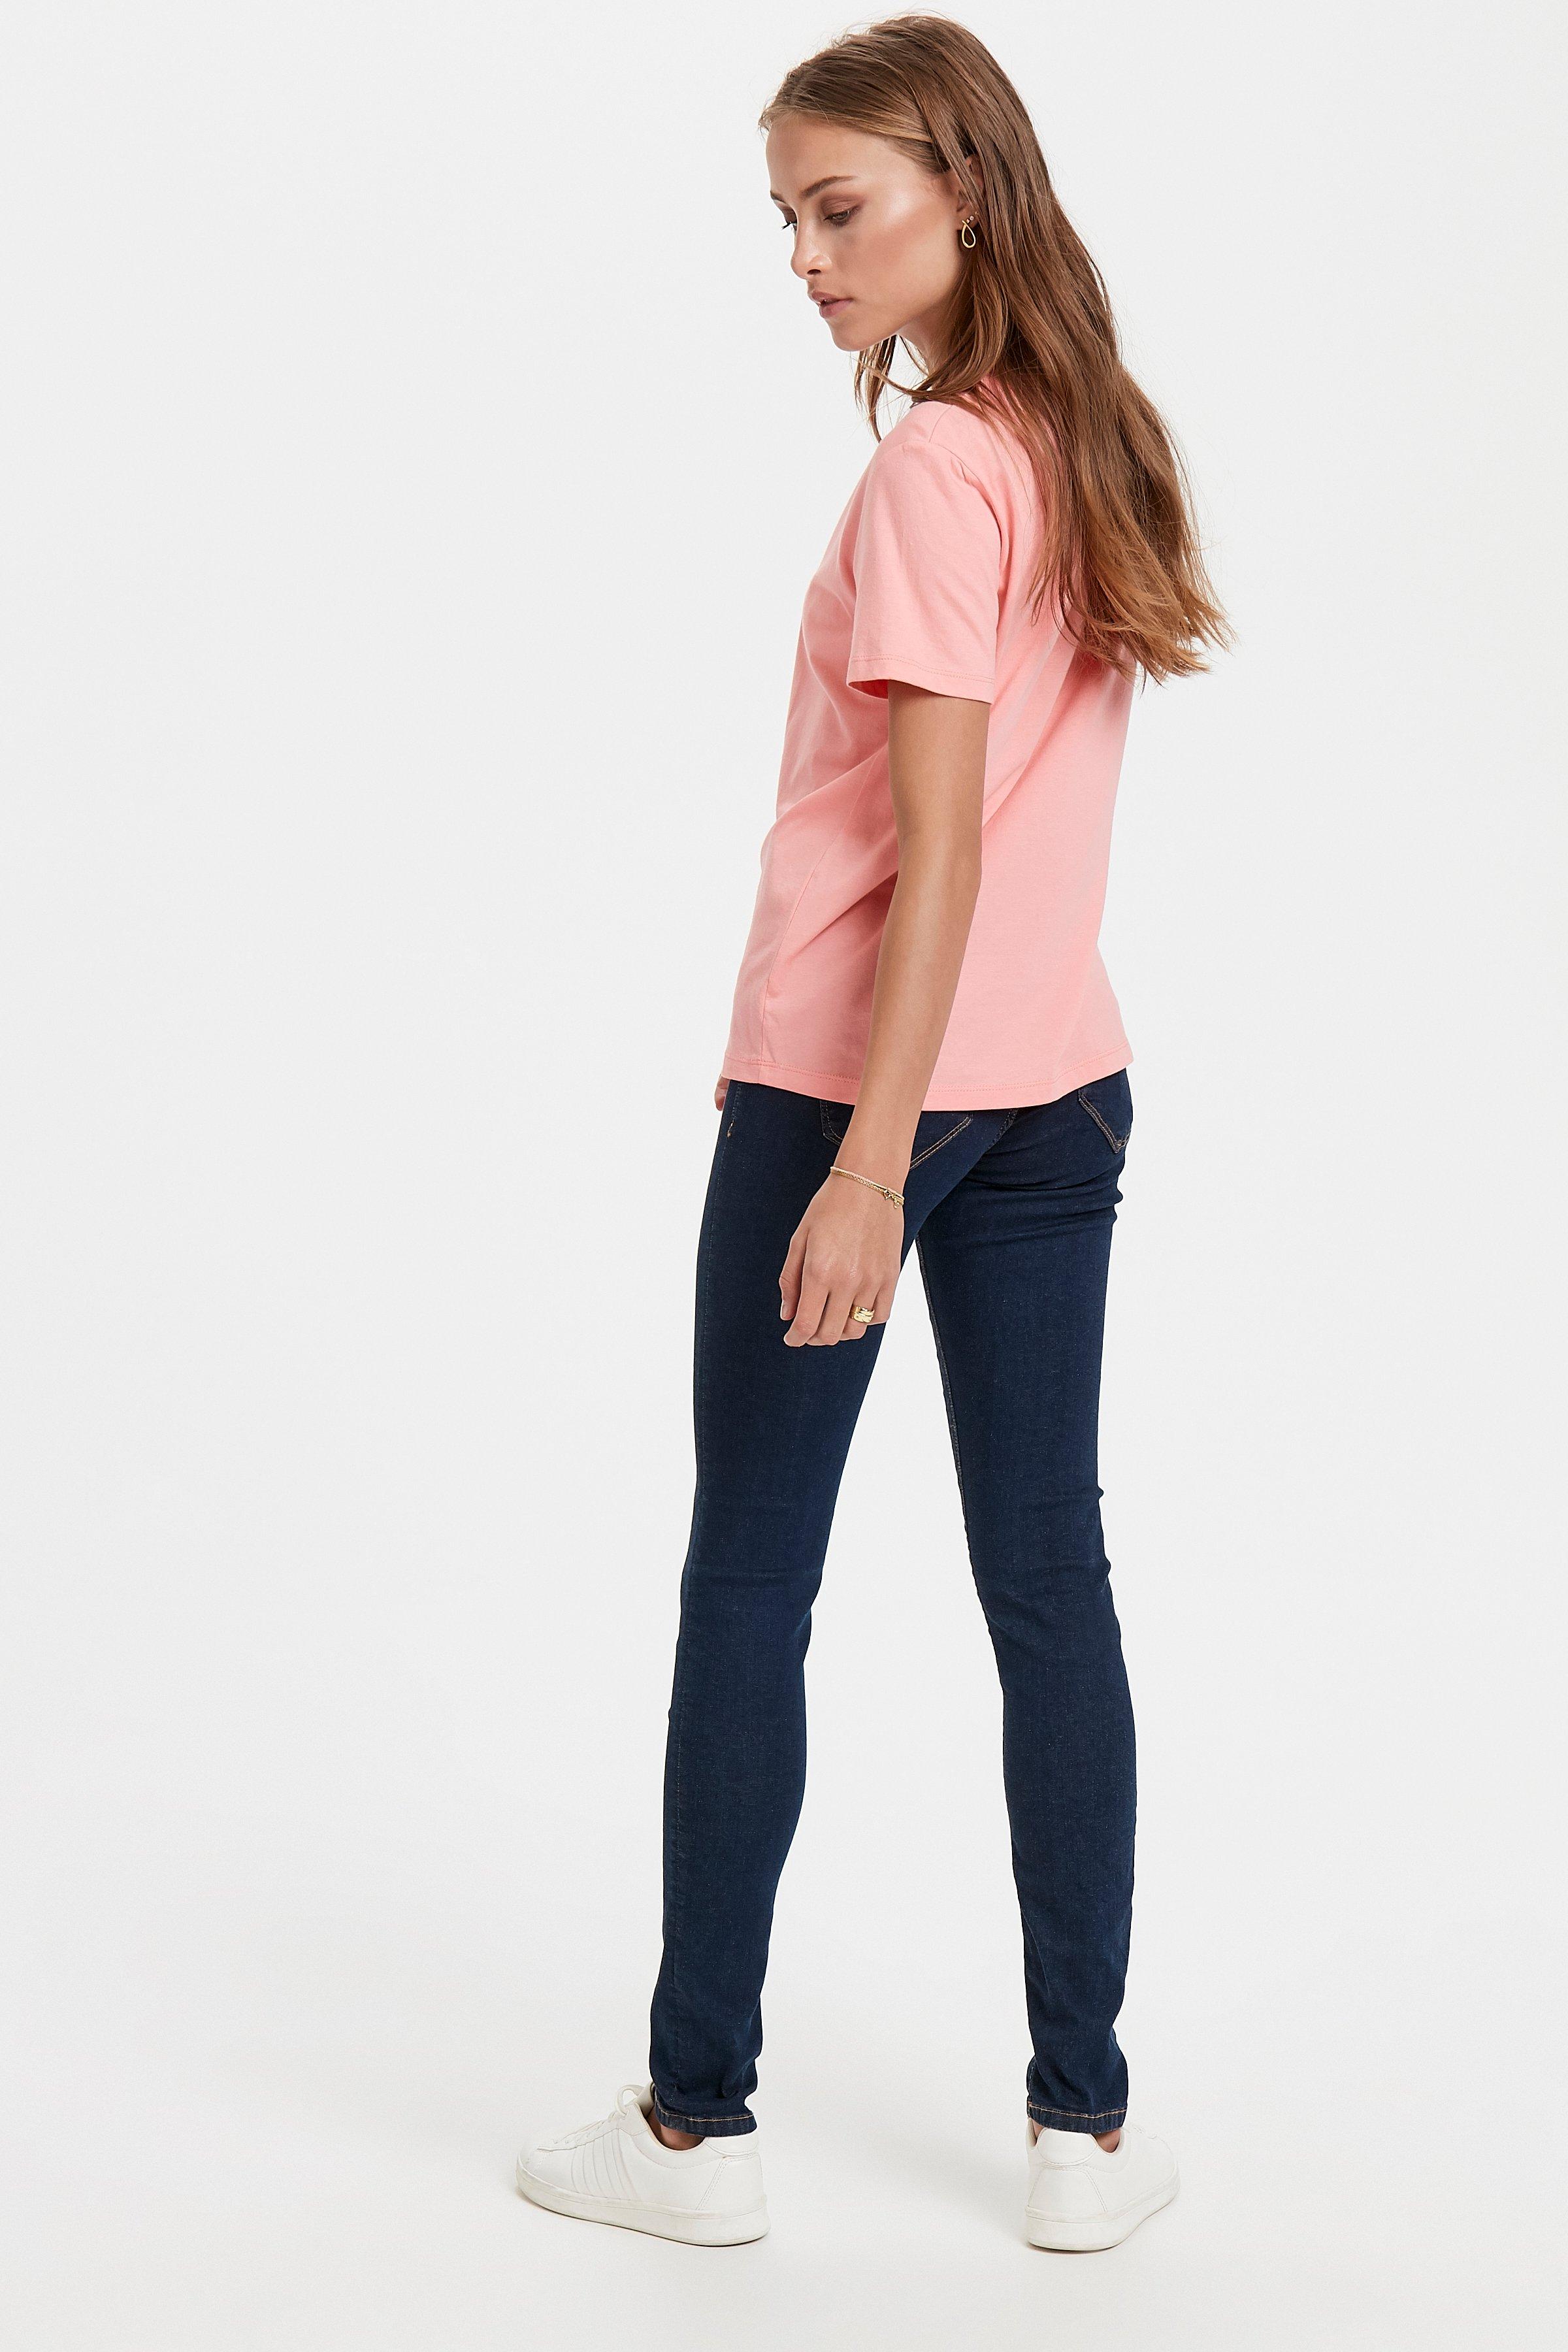 Salmon Rose T-shirt – Køb Salmon Rose T-shirt fra str. XS-XL her